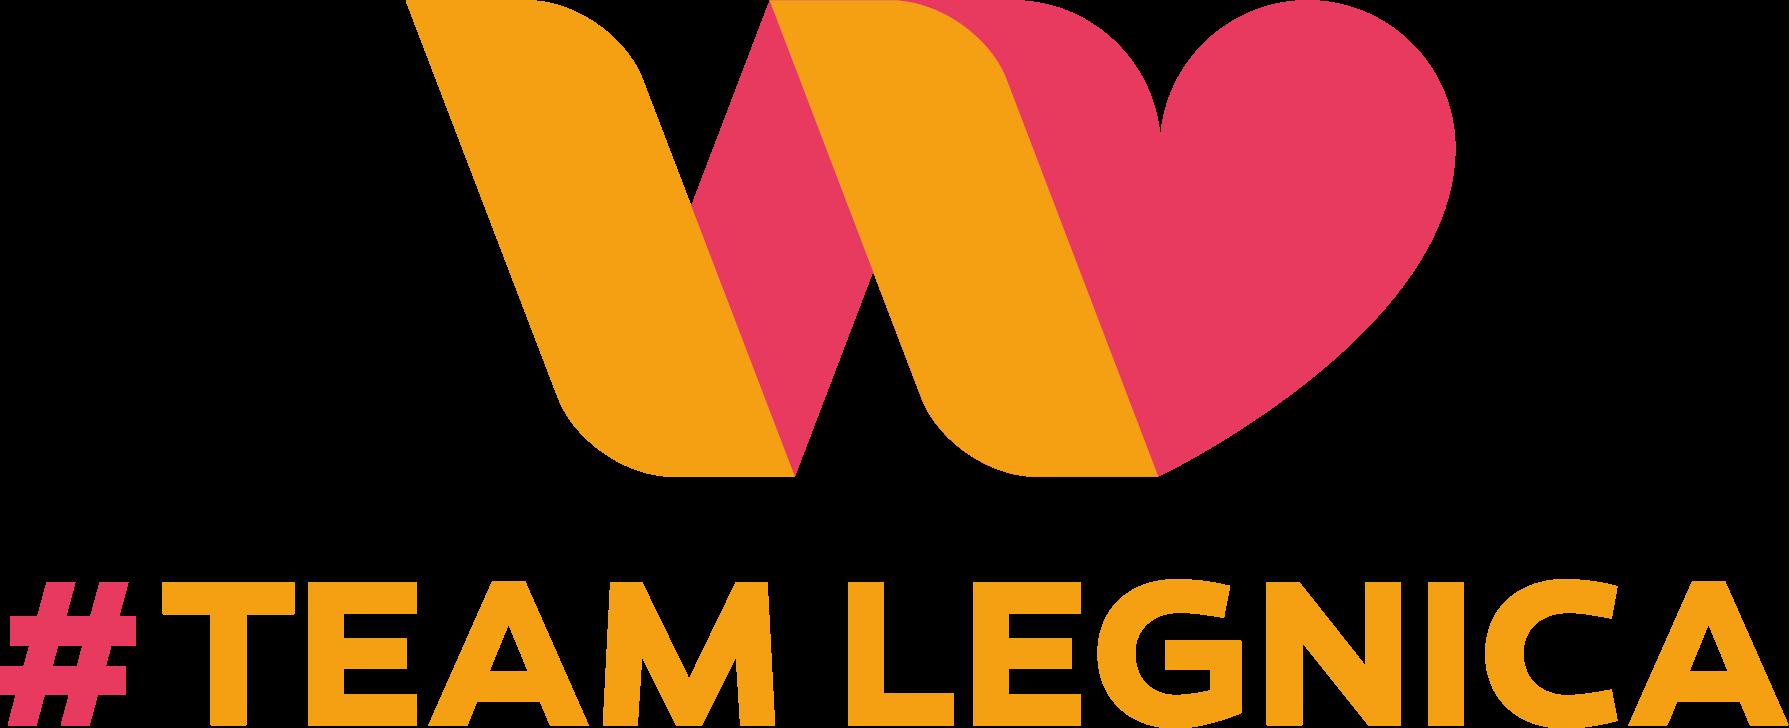 Głowne logo wolontariatu